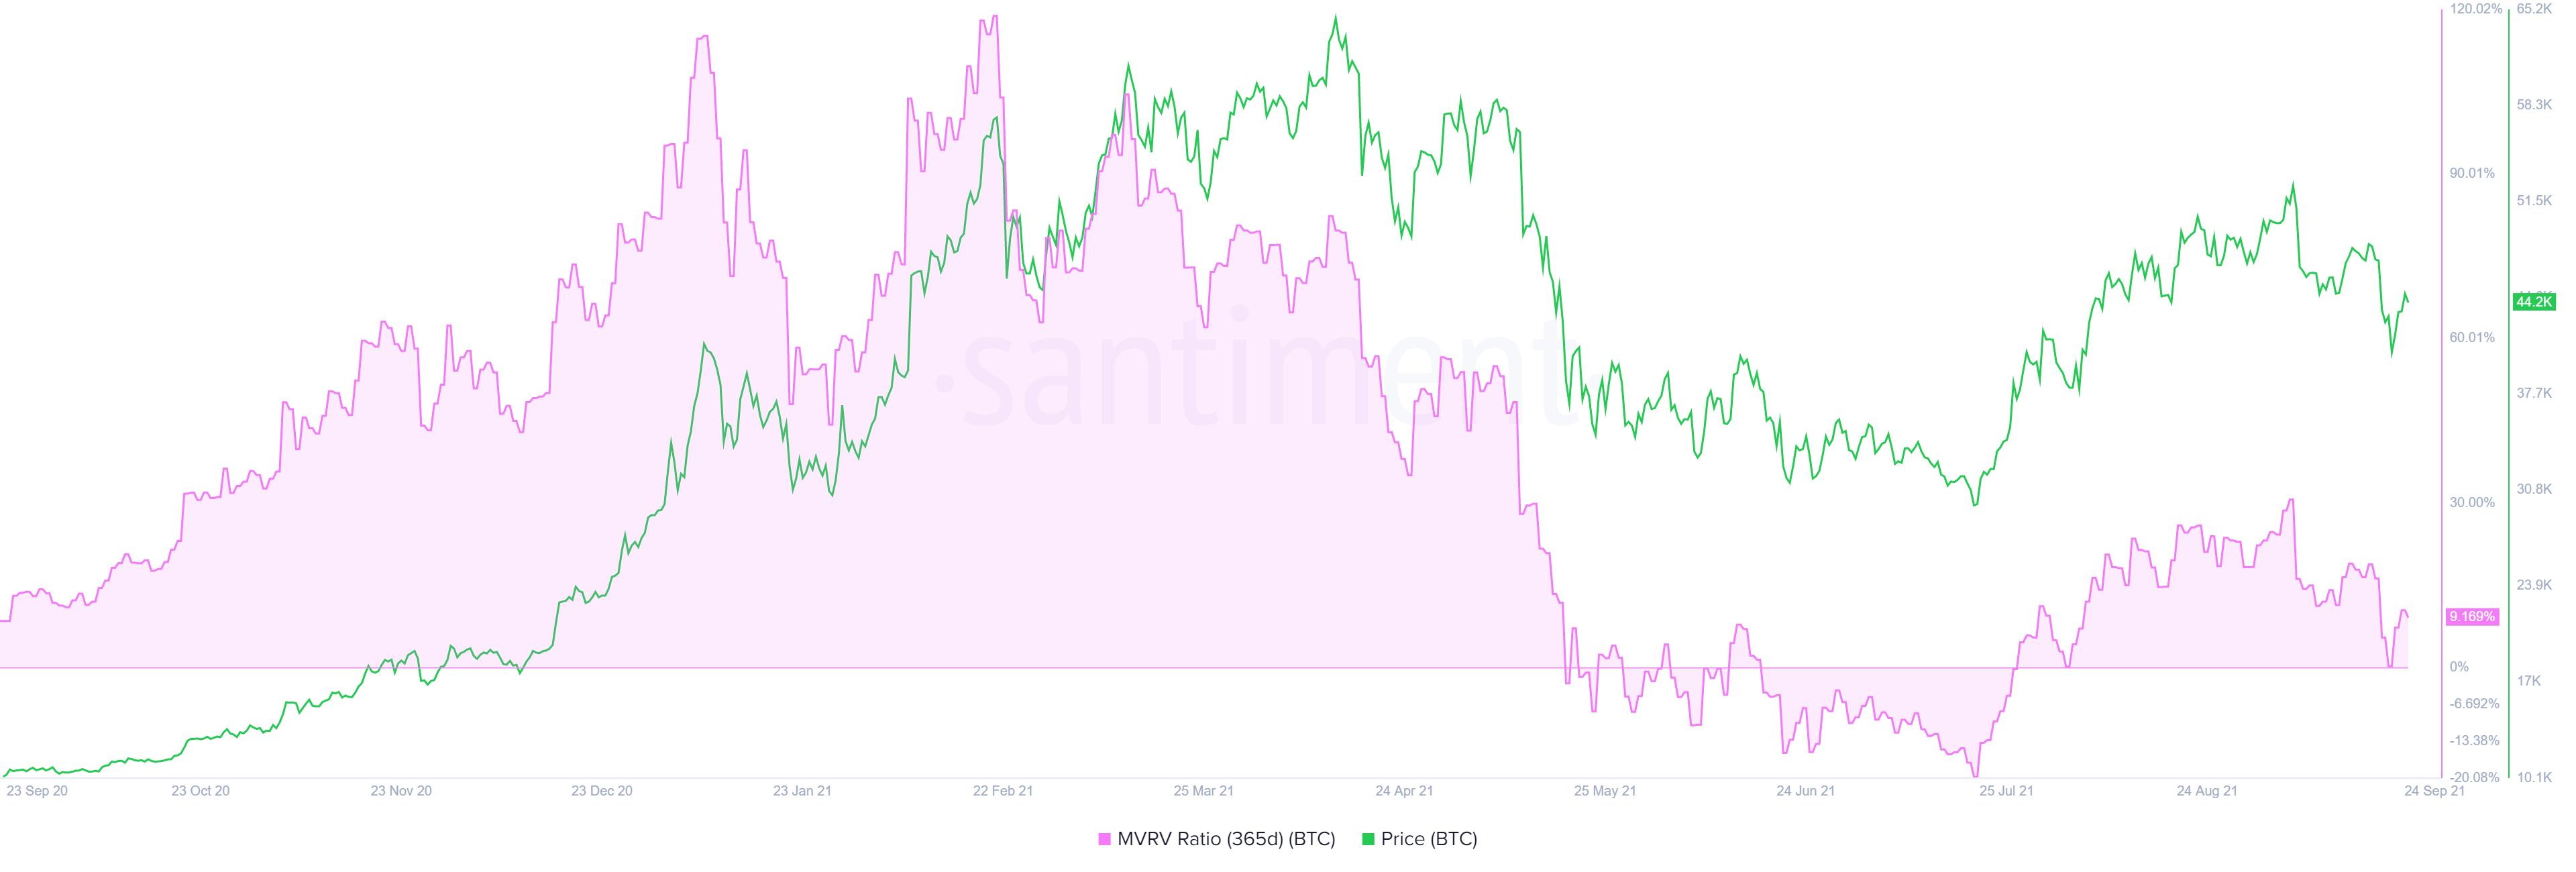 BTC 365-day MVRV chart